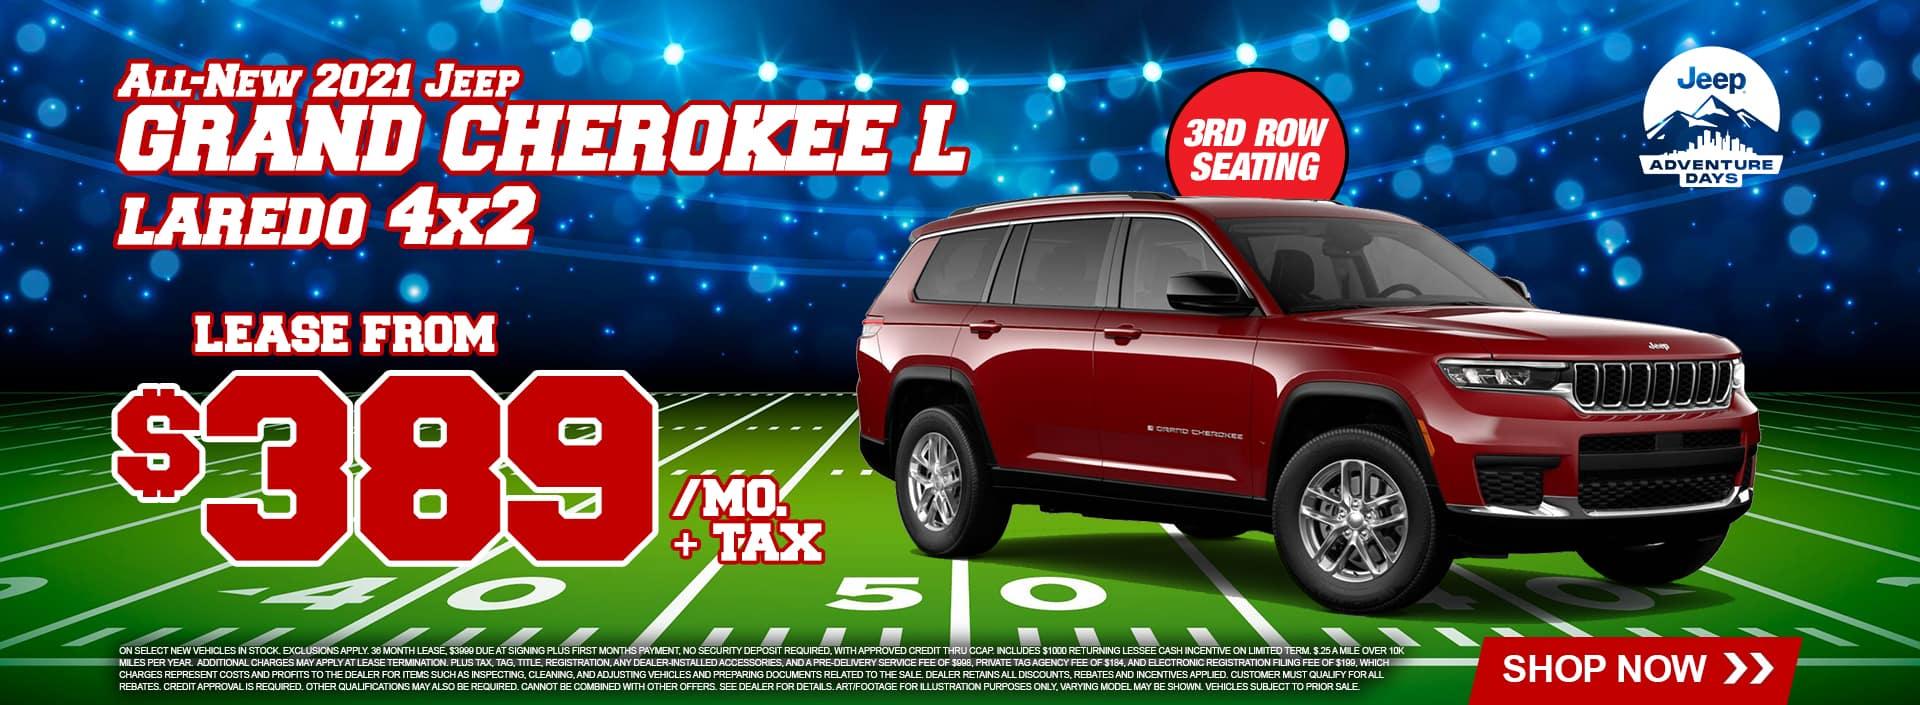 2021 Grand Cherokee L Lease Deals